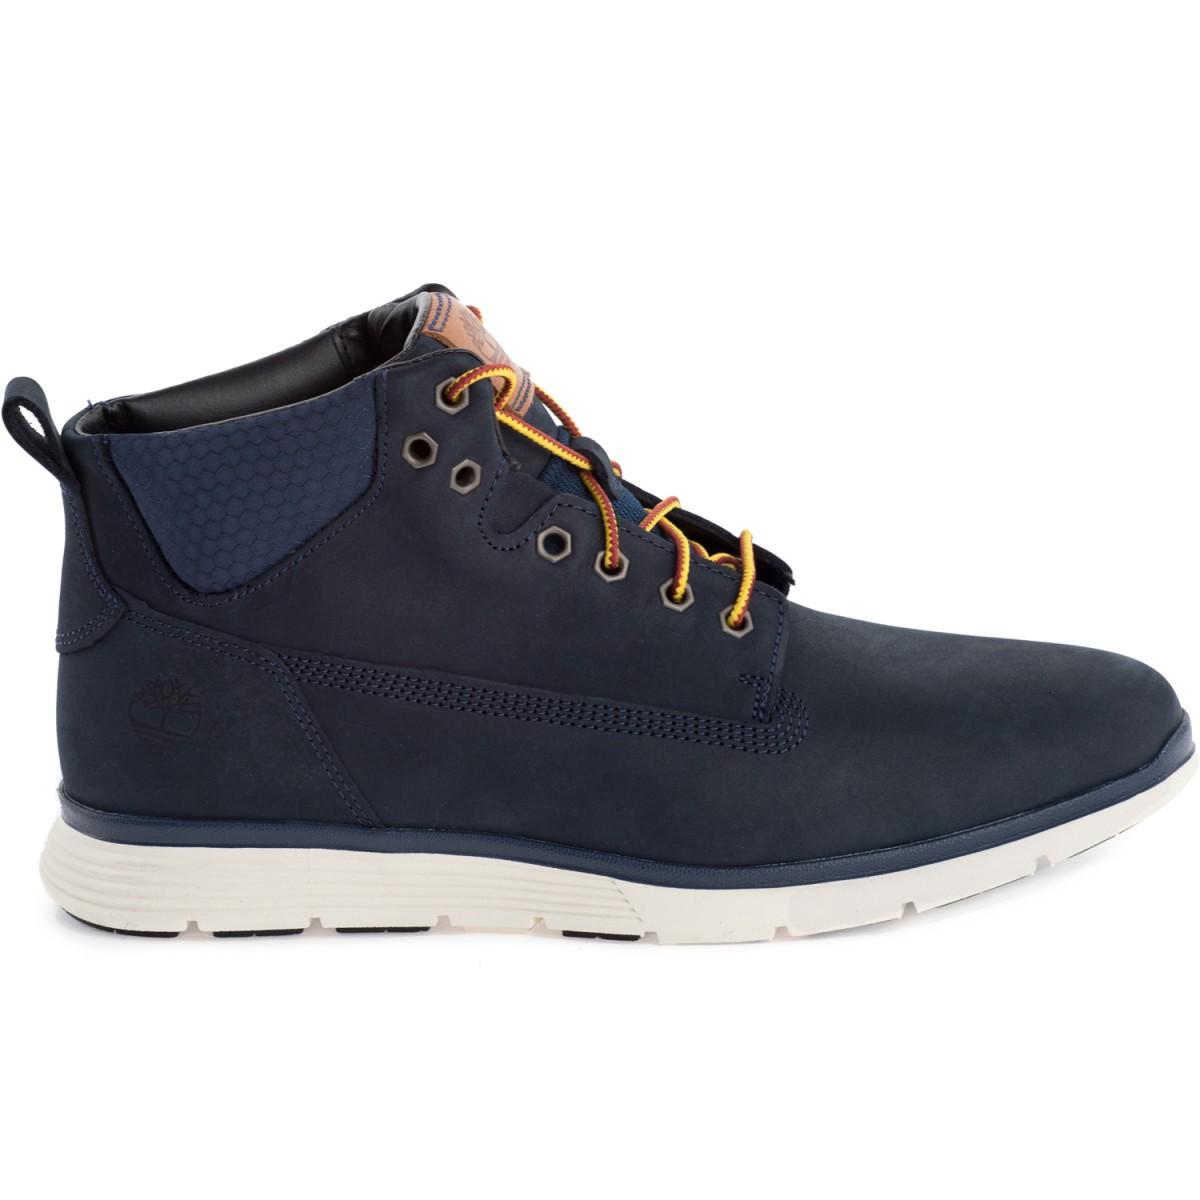 Timberland Killington Chukkas Boot